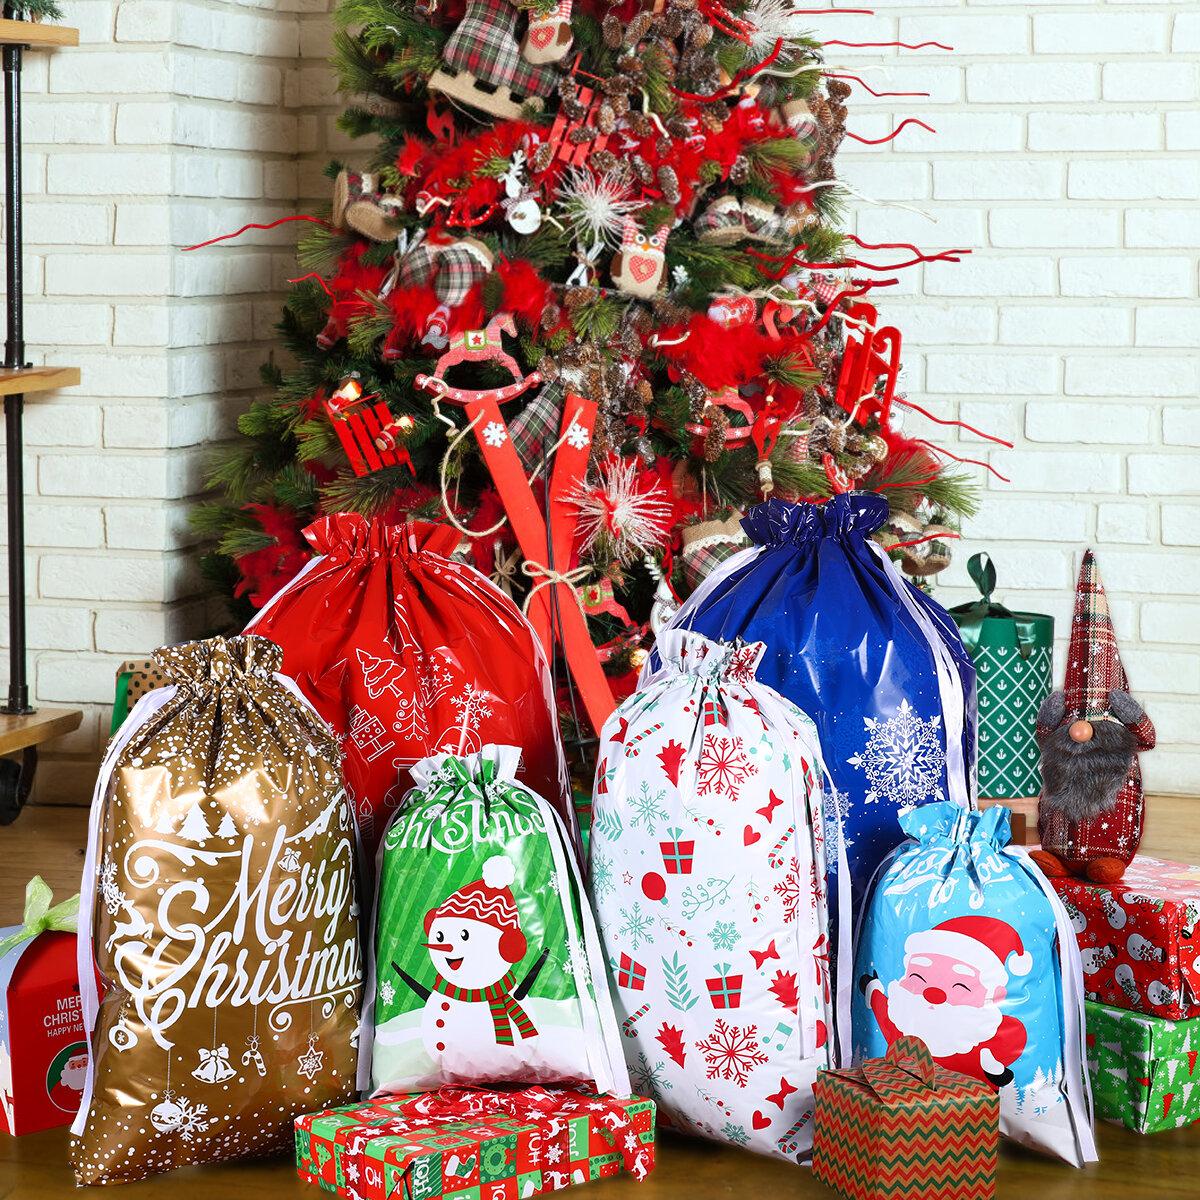 30pcs Treat Bags Gold Plastic Drawstring Candy Goodies Gift Bag Party Favor Xmas